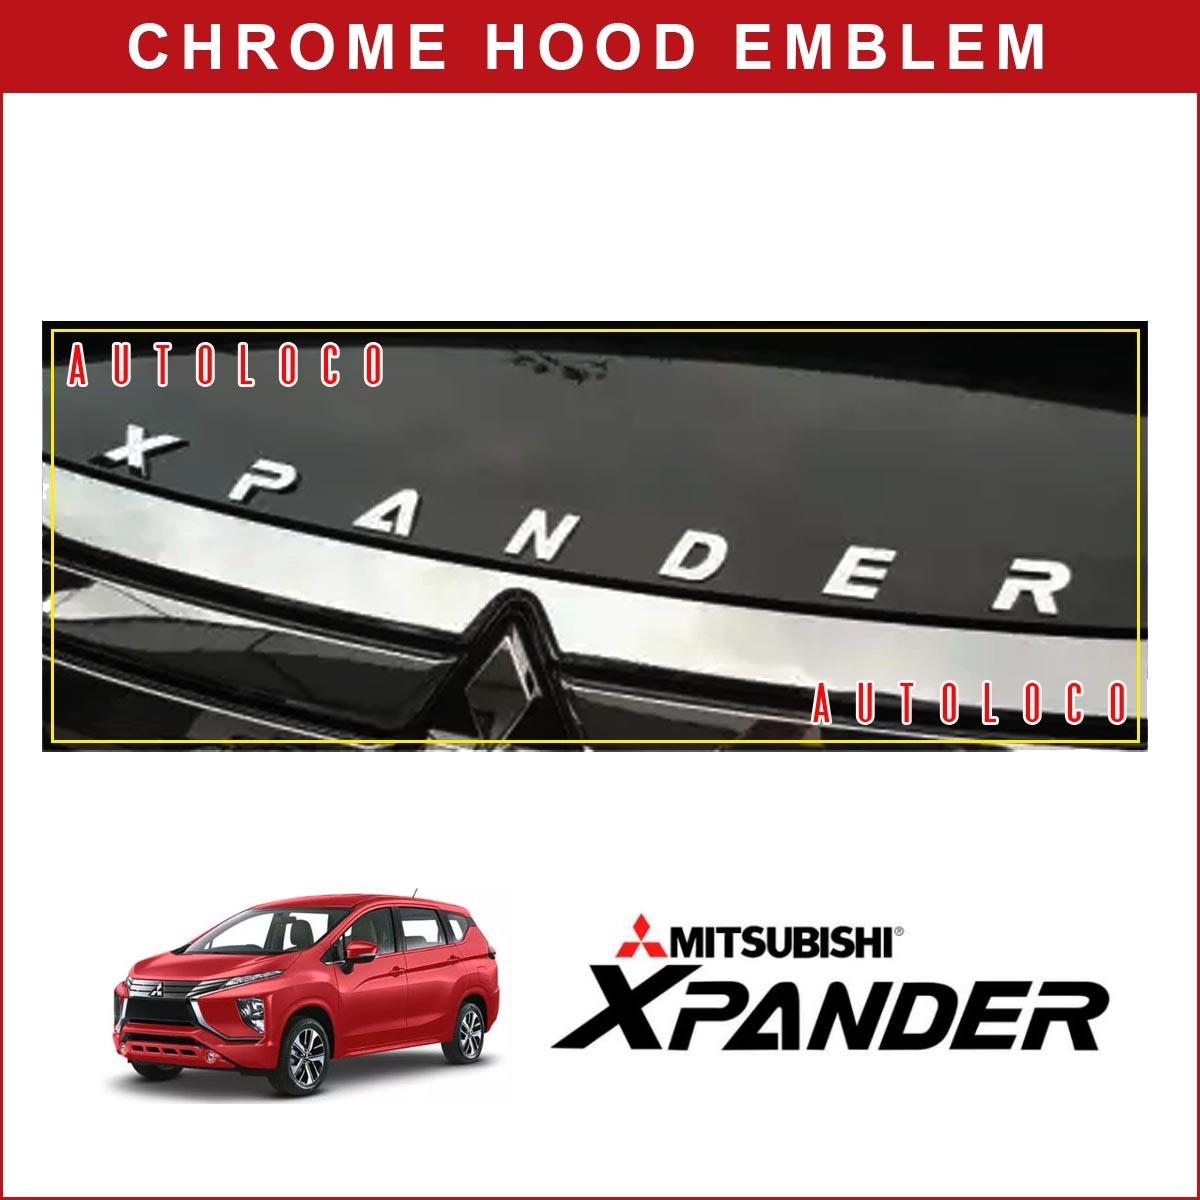 Mitsubishi Xpander (chrome) Hood Emblem By Autoloco.